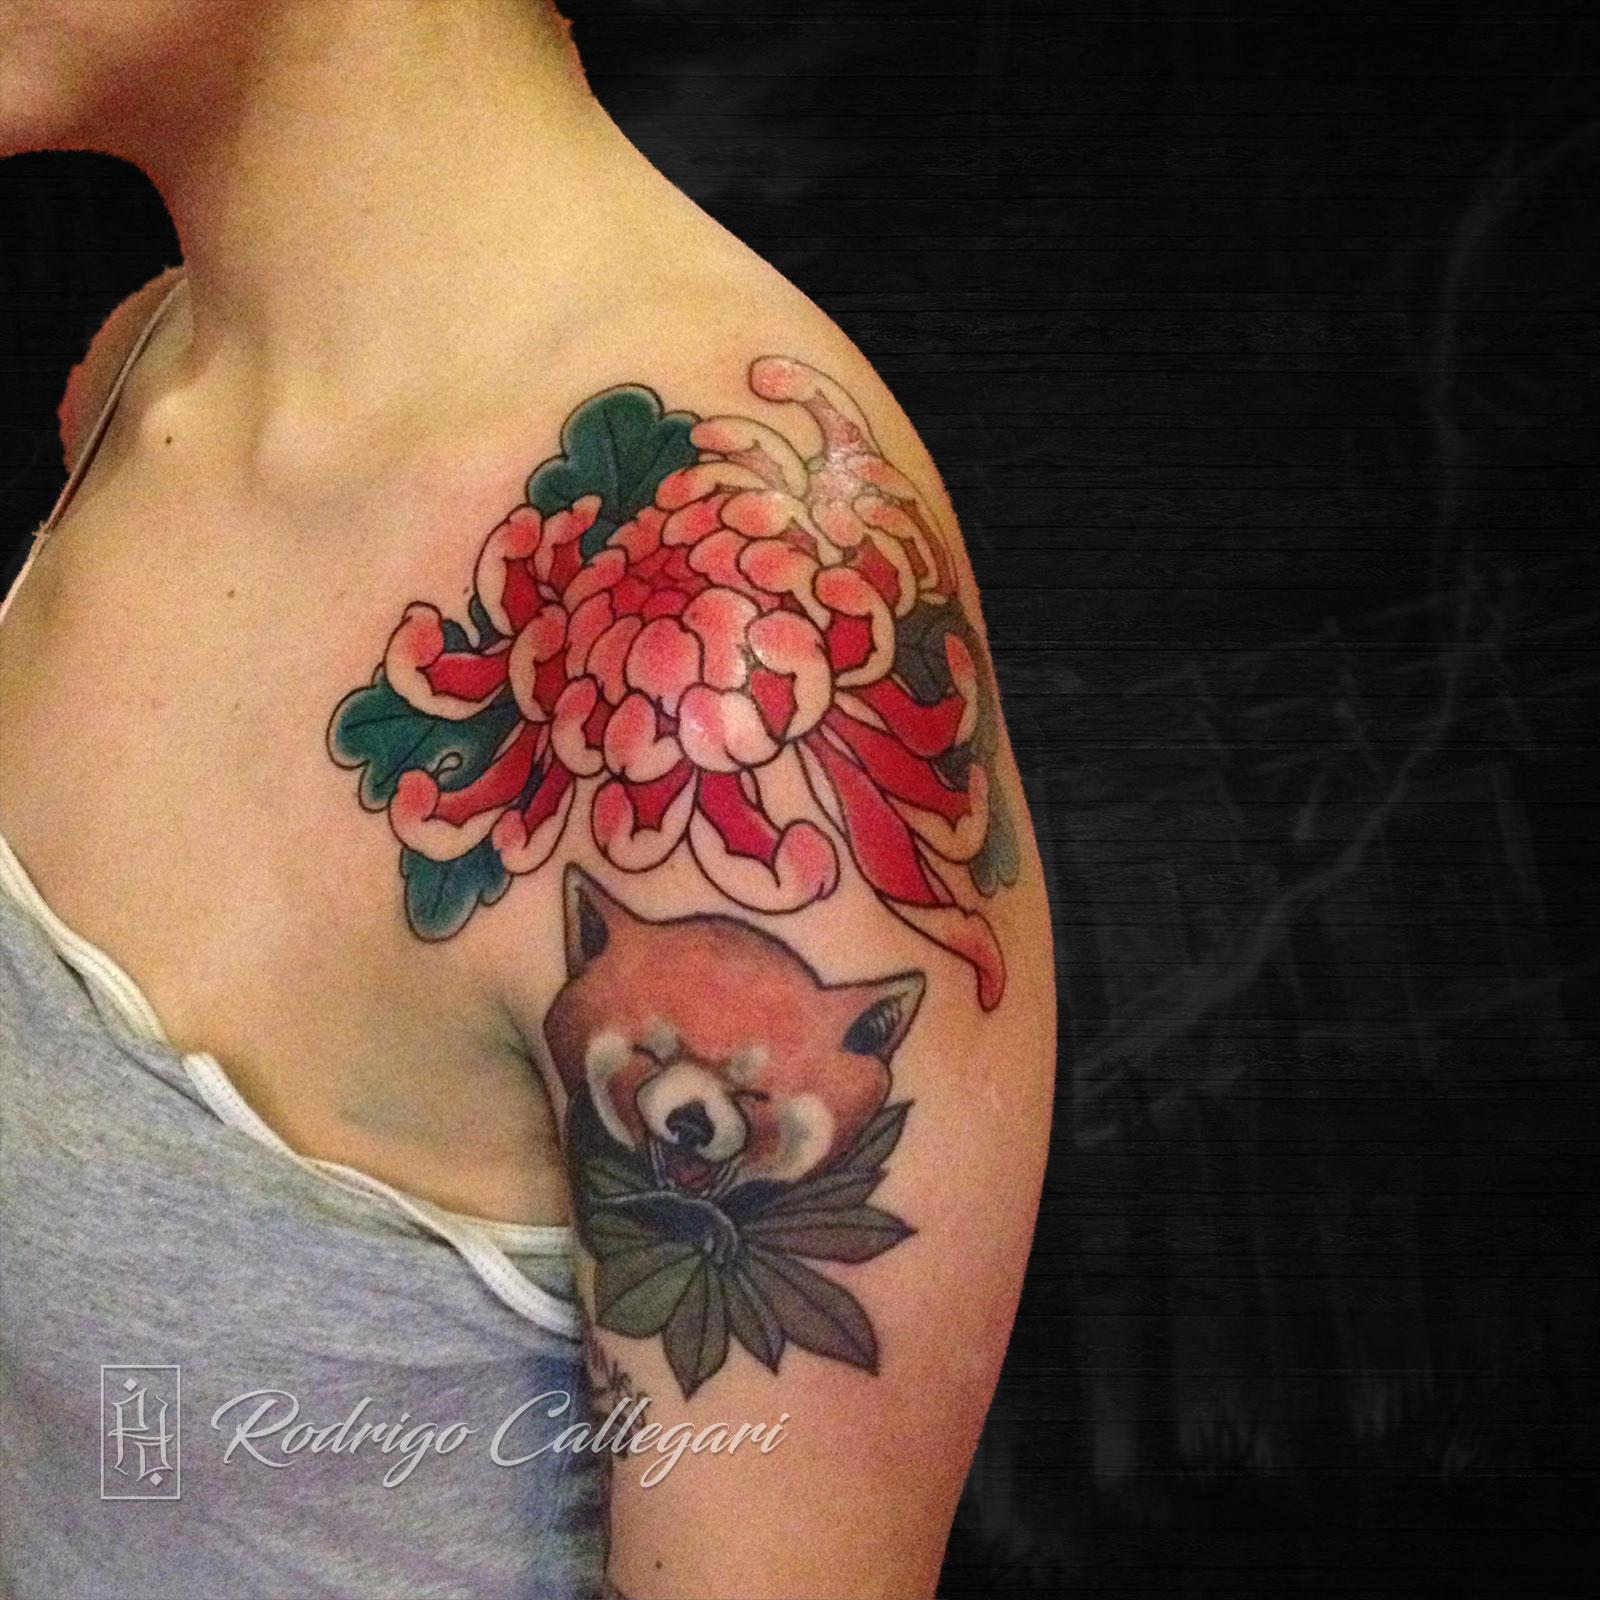 rodrigo-callegari-tattoo-japanese-48